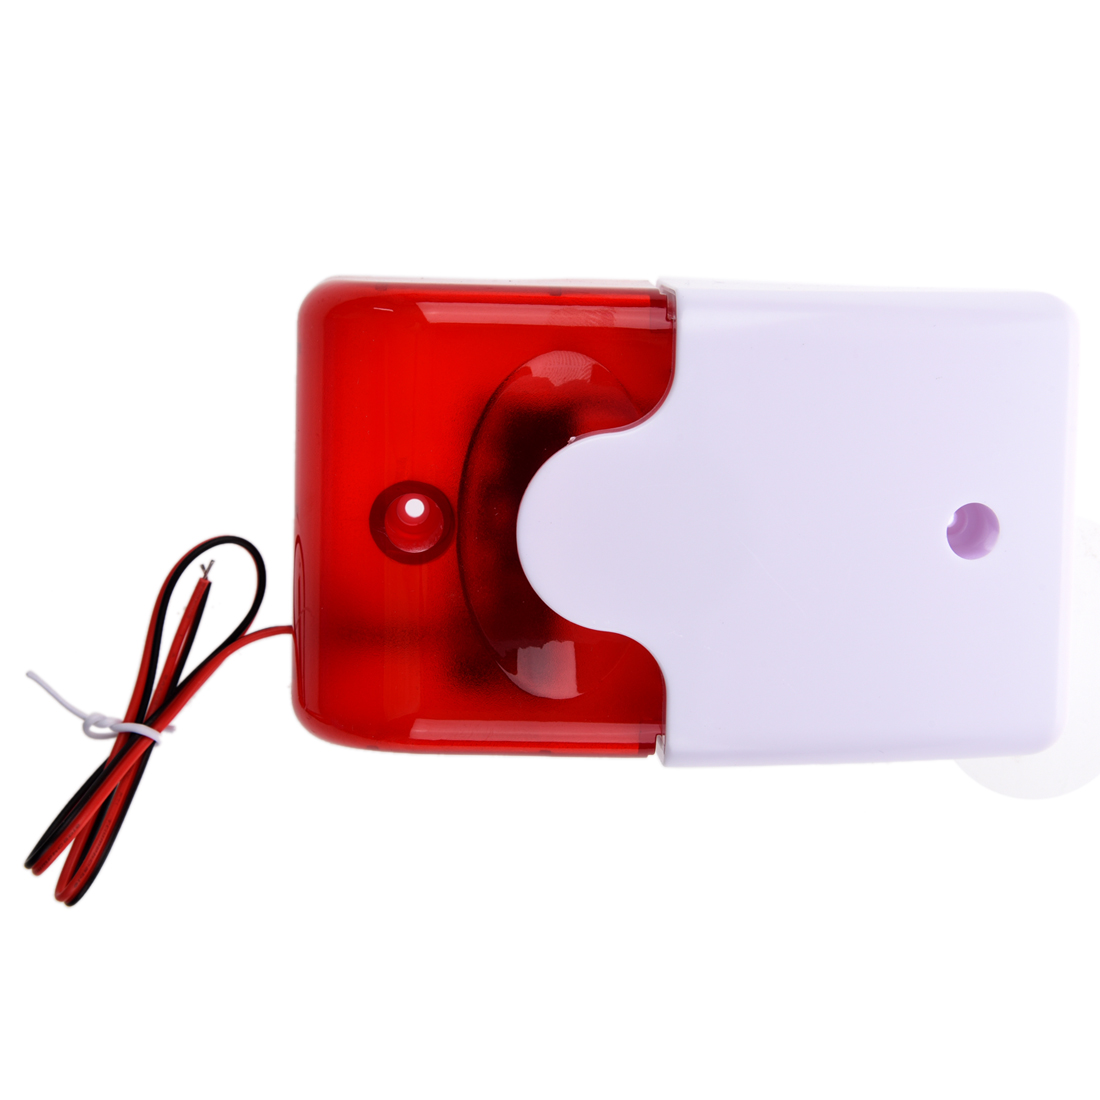 MOOL 12V Wired Sound Alarm Strobe Blinklicht Sirene Home Security System